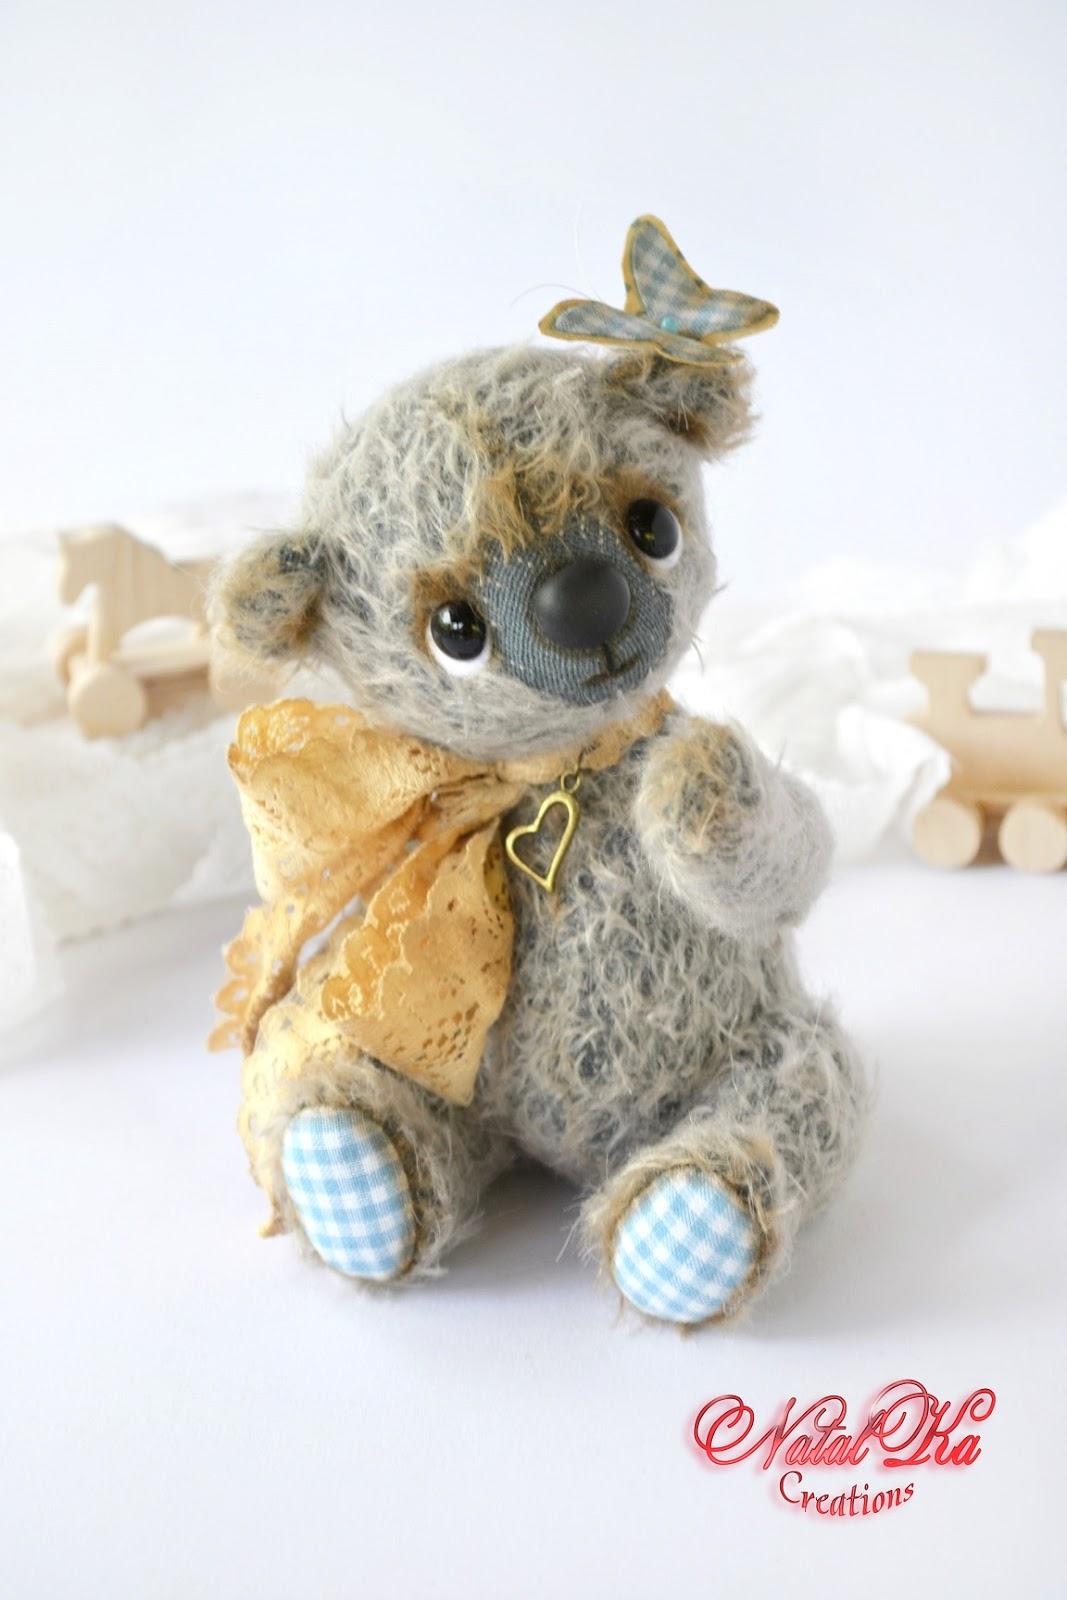 Artist teddy bear handmade by NatalKa Creations. Künstlerteddybär handgemacht von NatalKa Creations.